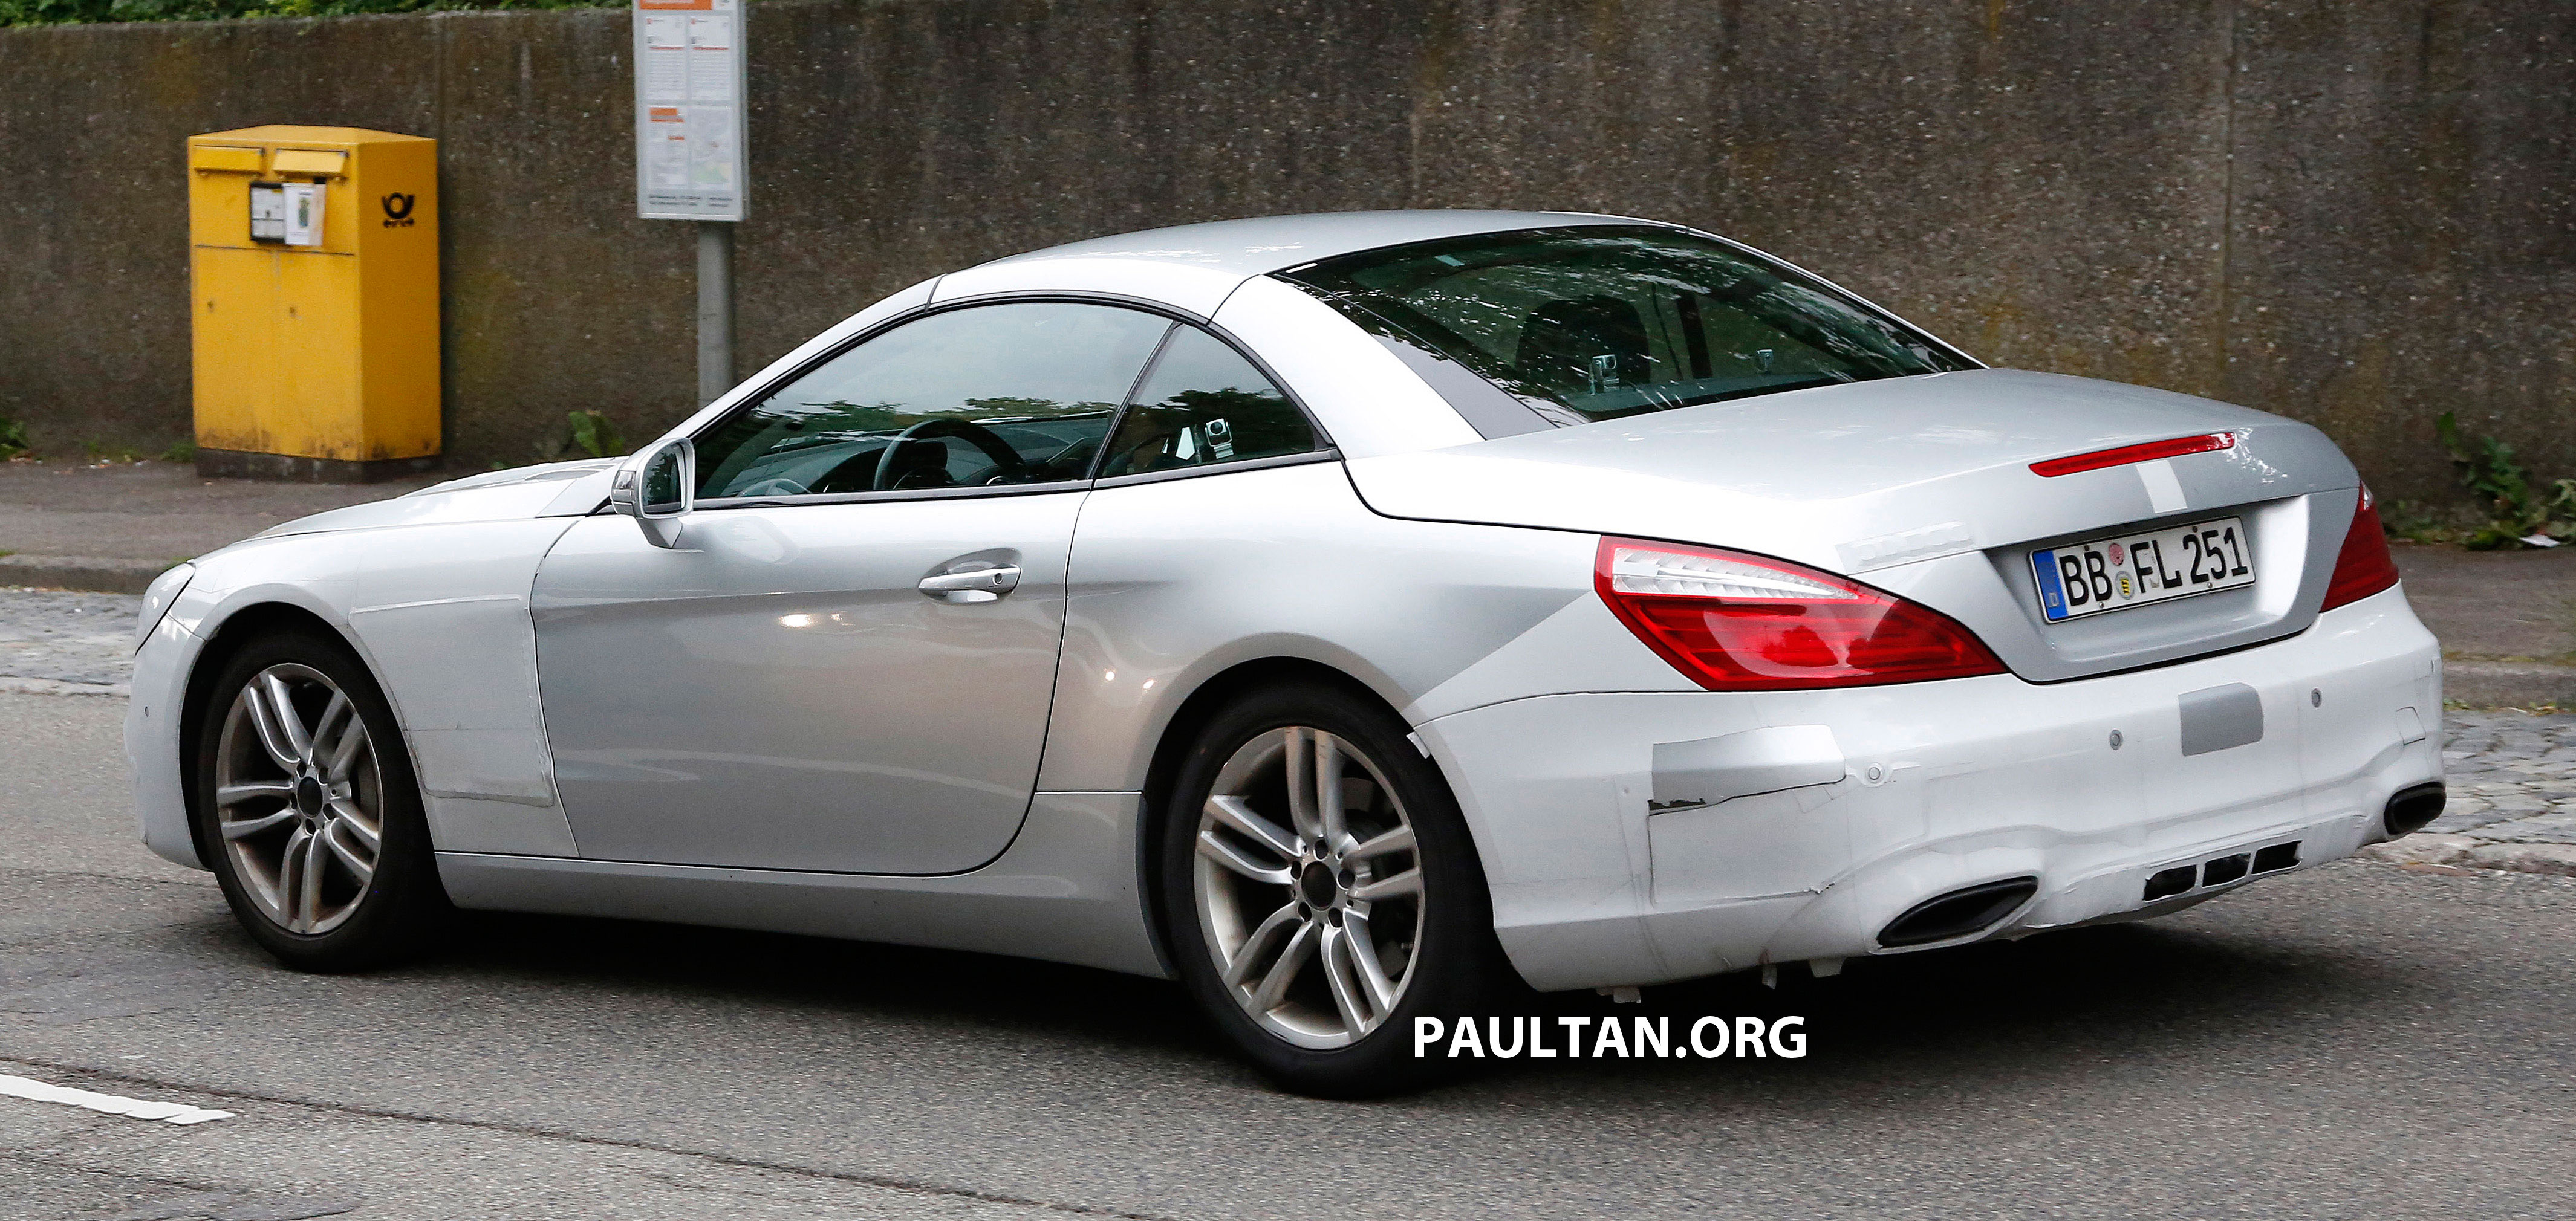 SPYSHOTS: Mercedes-Benz SL update to get new face Paul Tan ...